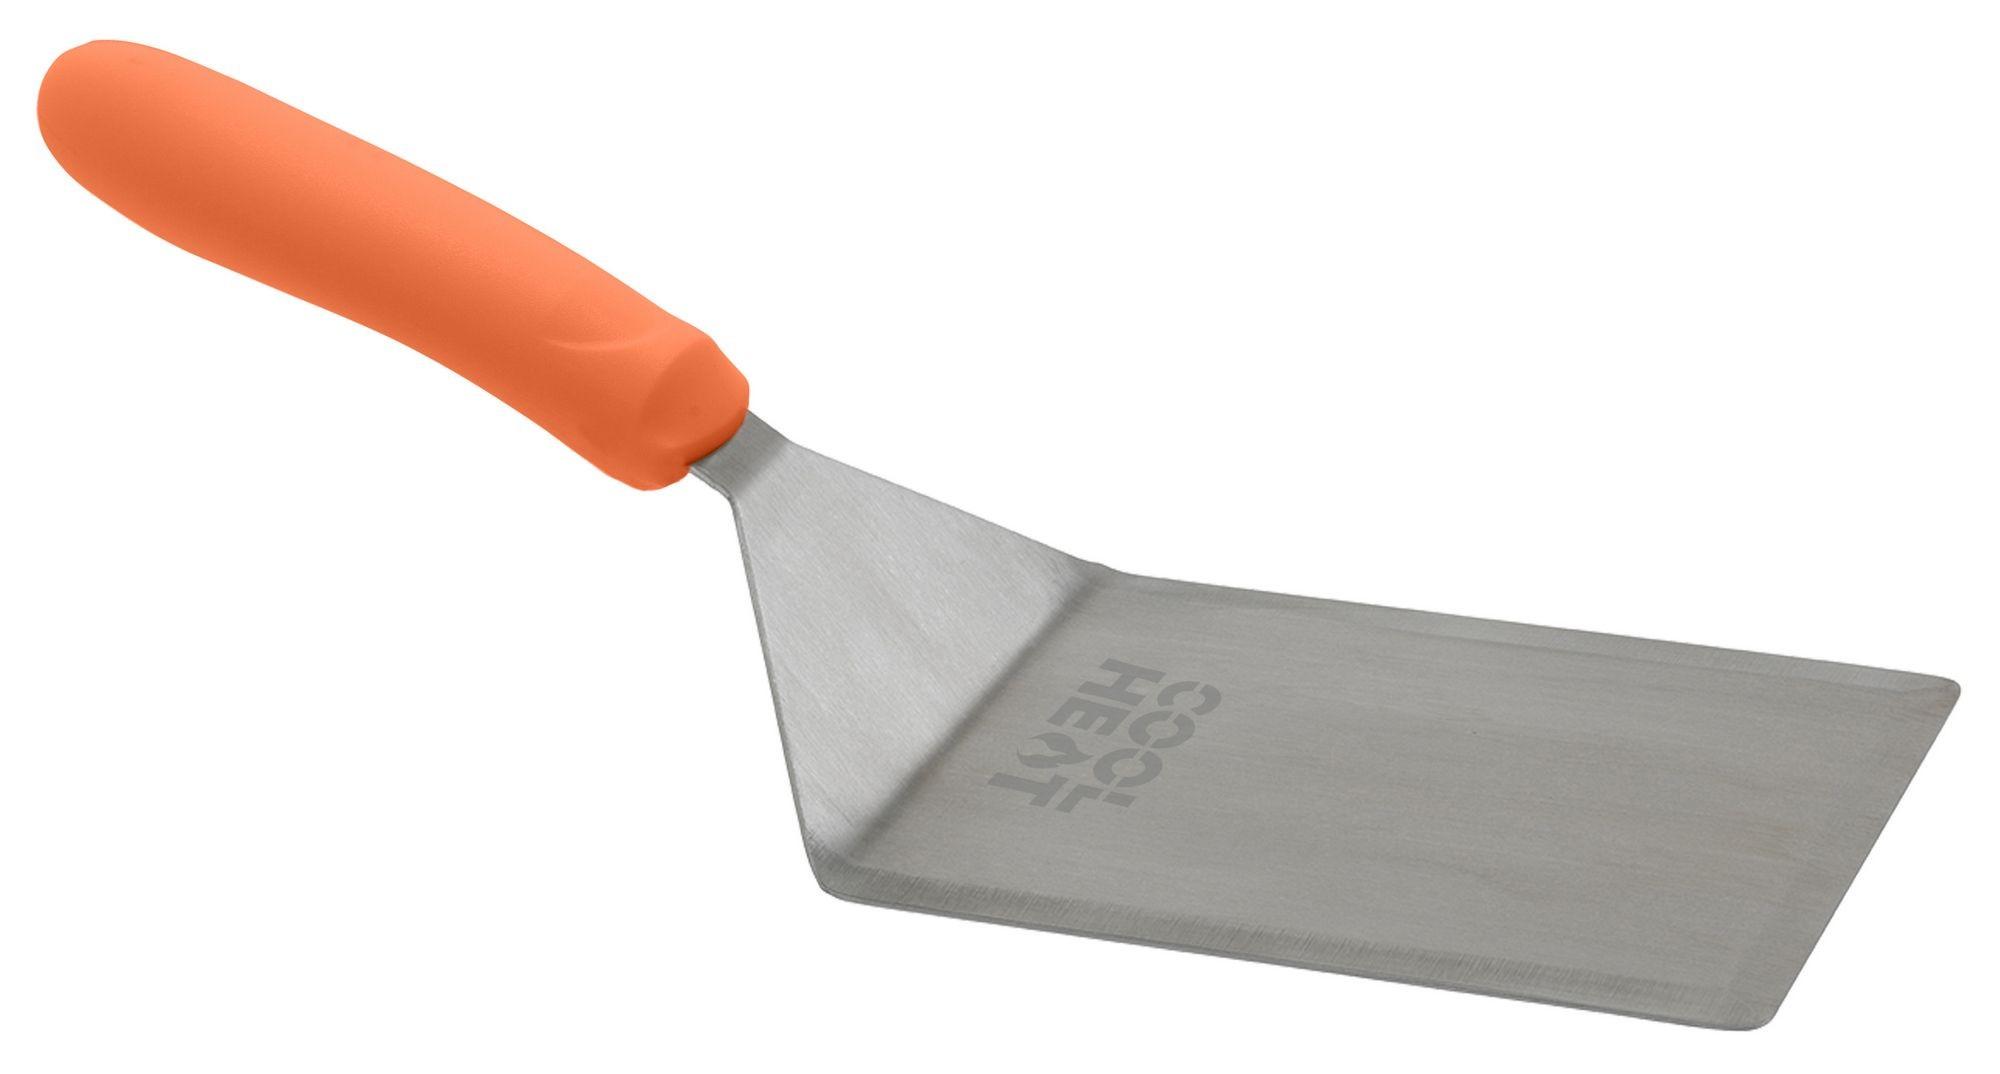 "Winco TNH-63 Extra Heavy Turner with Cutting Edge and Orange Nylon Handle, 5"" x 6"" Blade"